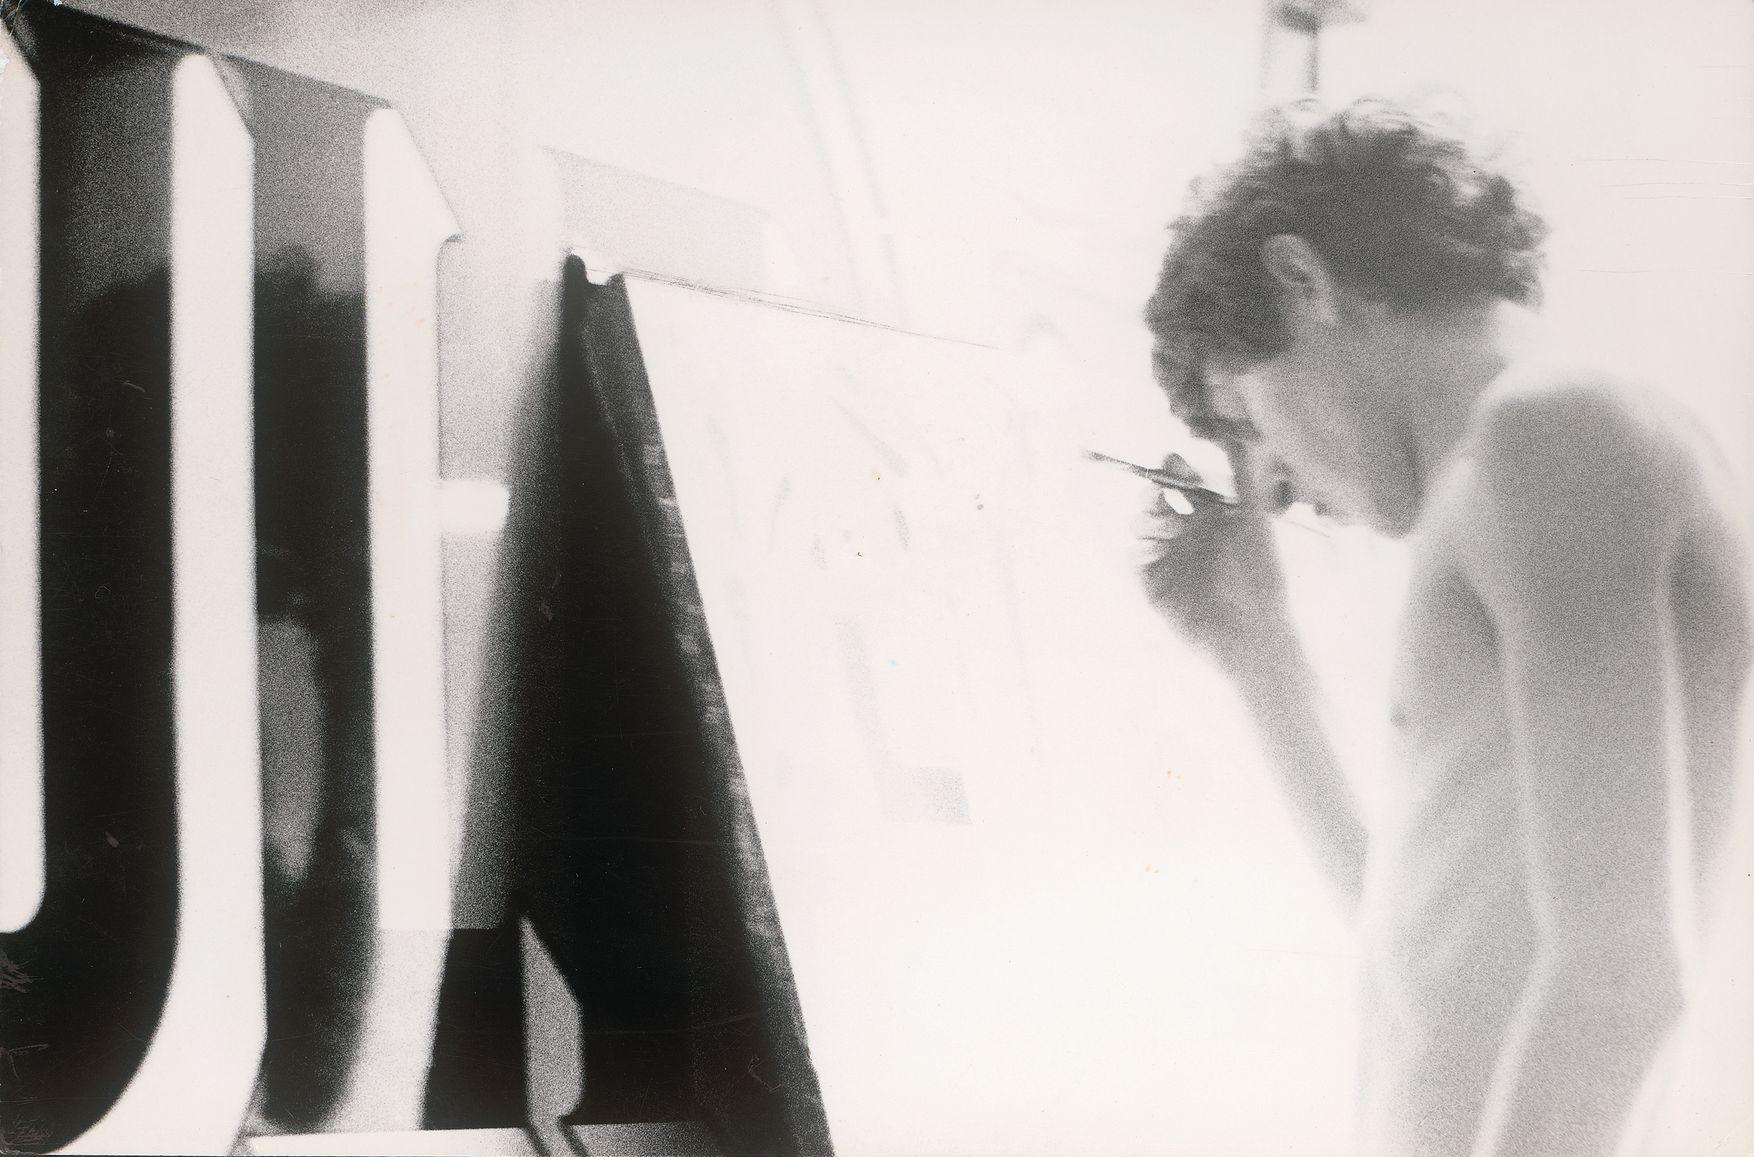 alfa_konyv_lorinczy_gyorgy_new_york_1968.jpg